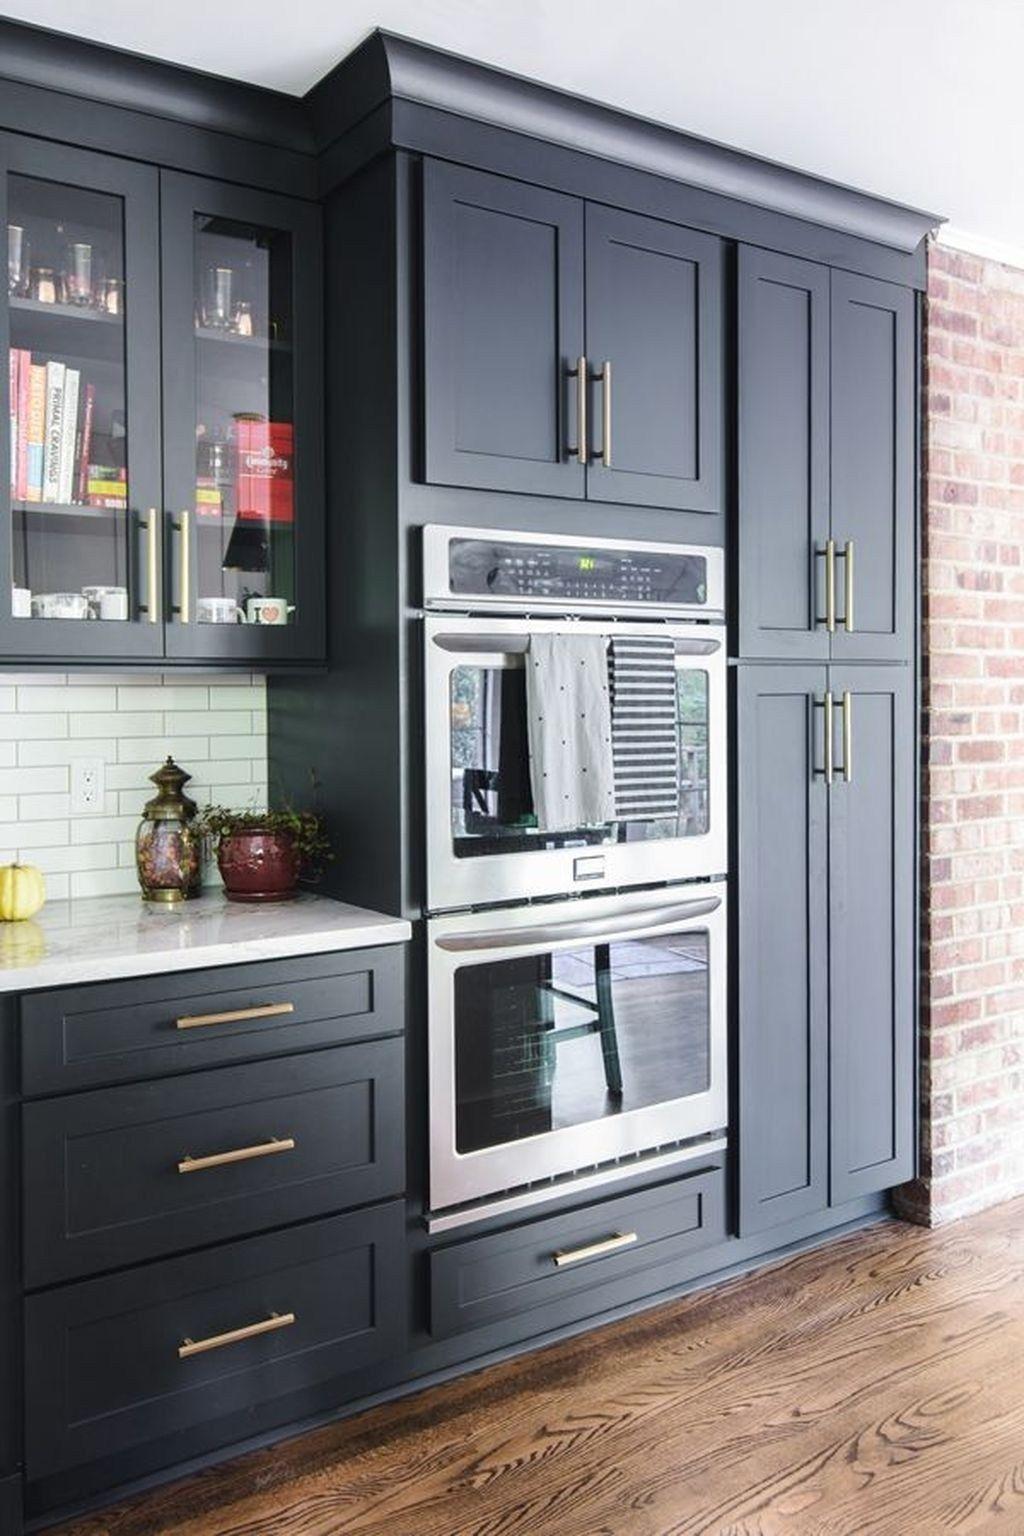 30 Astonishing Built Kitchen Pantry Design Ideas Trendhmdcr Com Ideasforthekitchendesign Kitchen Pantry Design Pantry Design Black Kitchen Cabinets